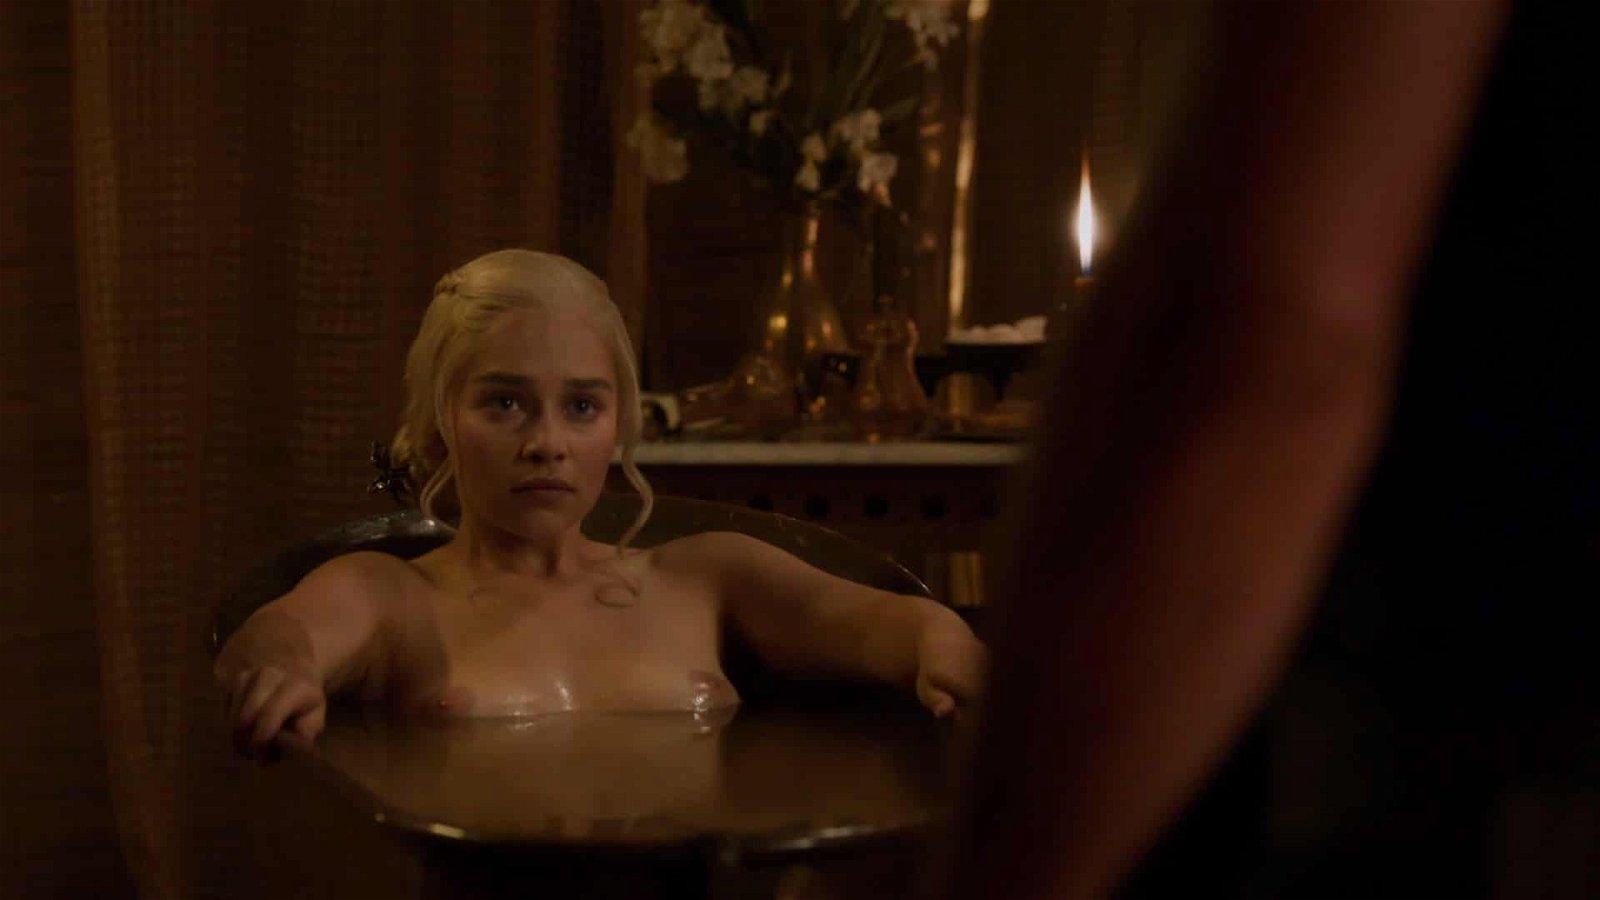 Emilia Clarke completely nude in bathtub nipples showing